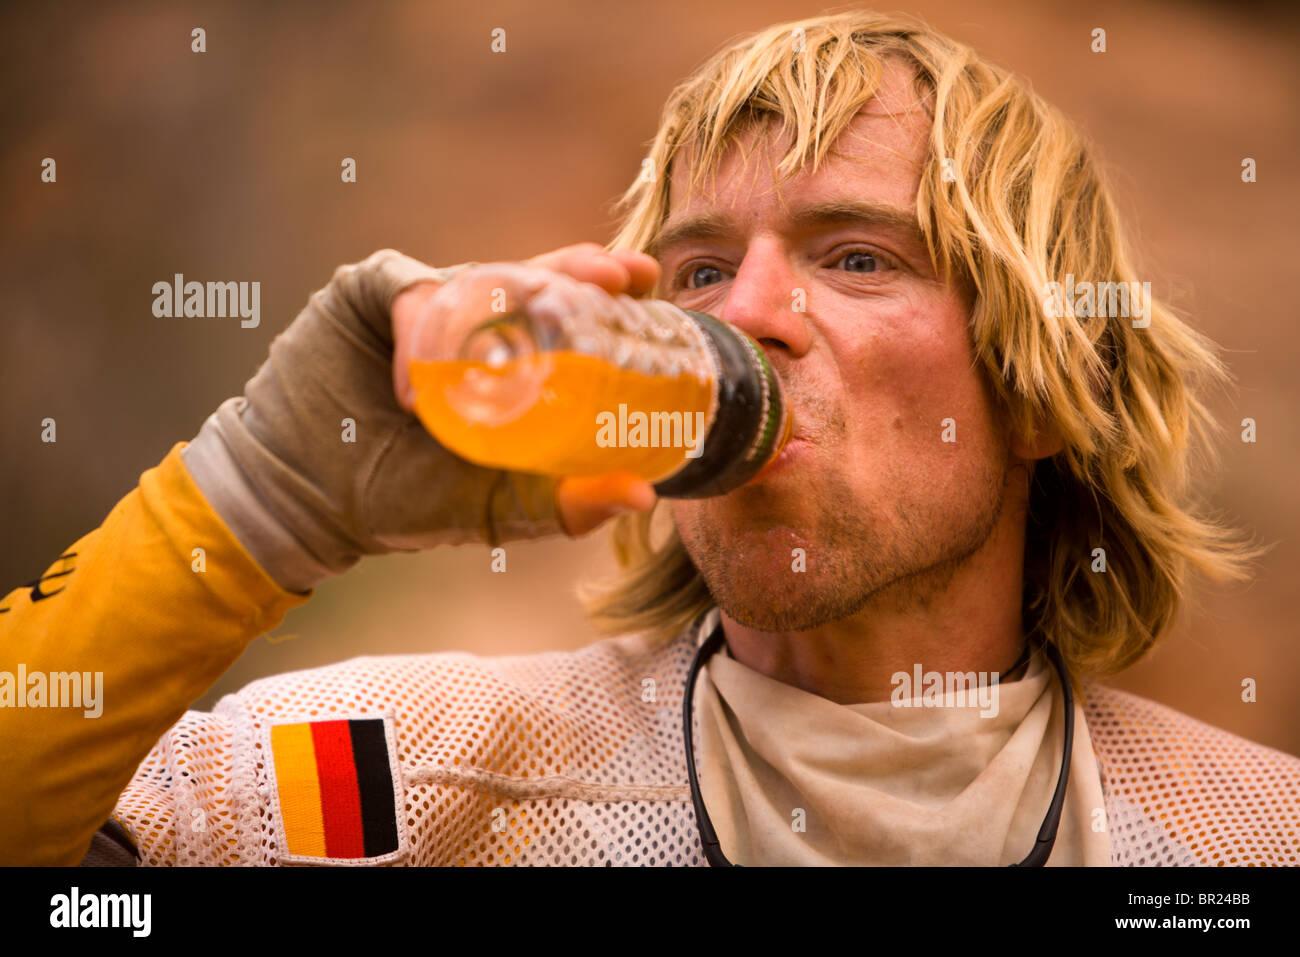 Hombre bebiendo una bebida energética durante una carrera de aventura cerca de Moab, Utah. Imagen De Stock